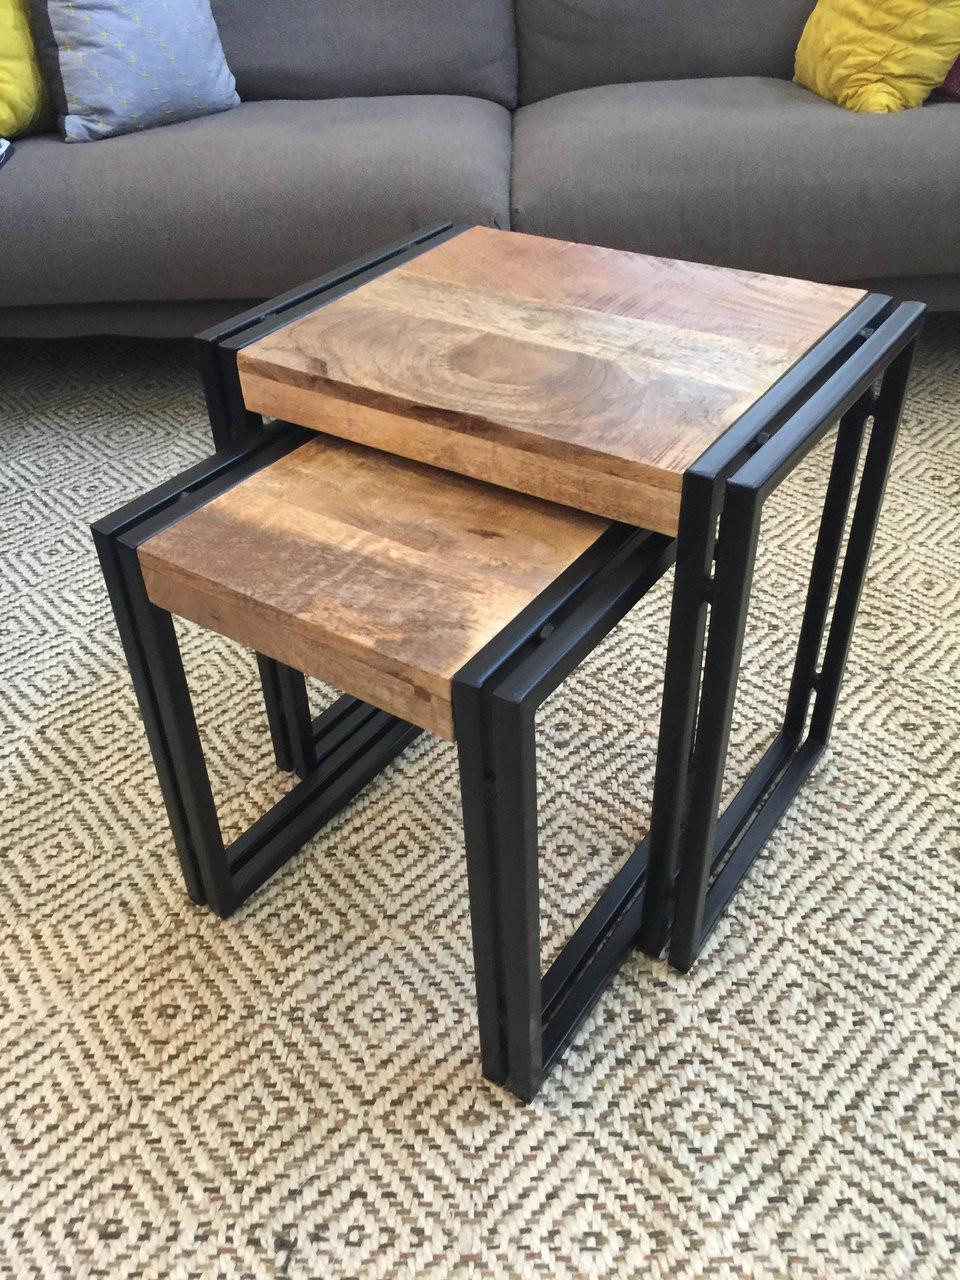 Reclaimed wood metal nesting table set of timbergirl